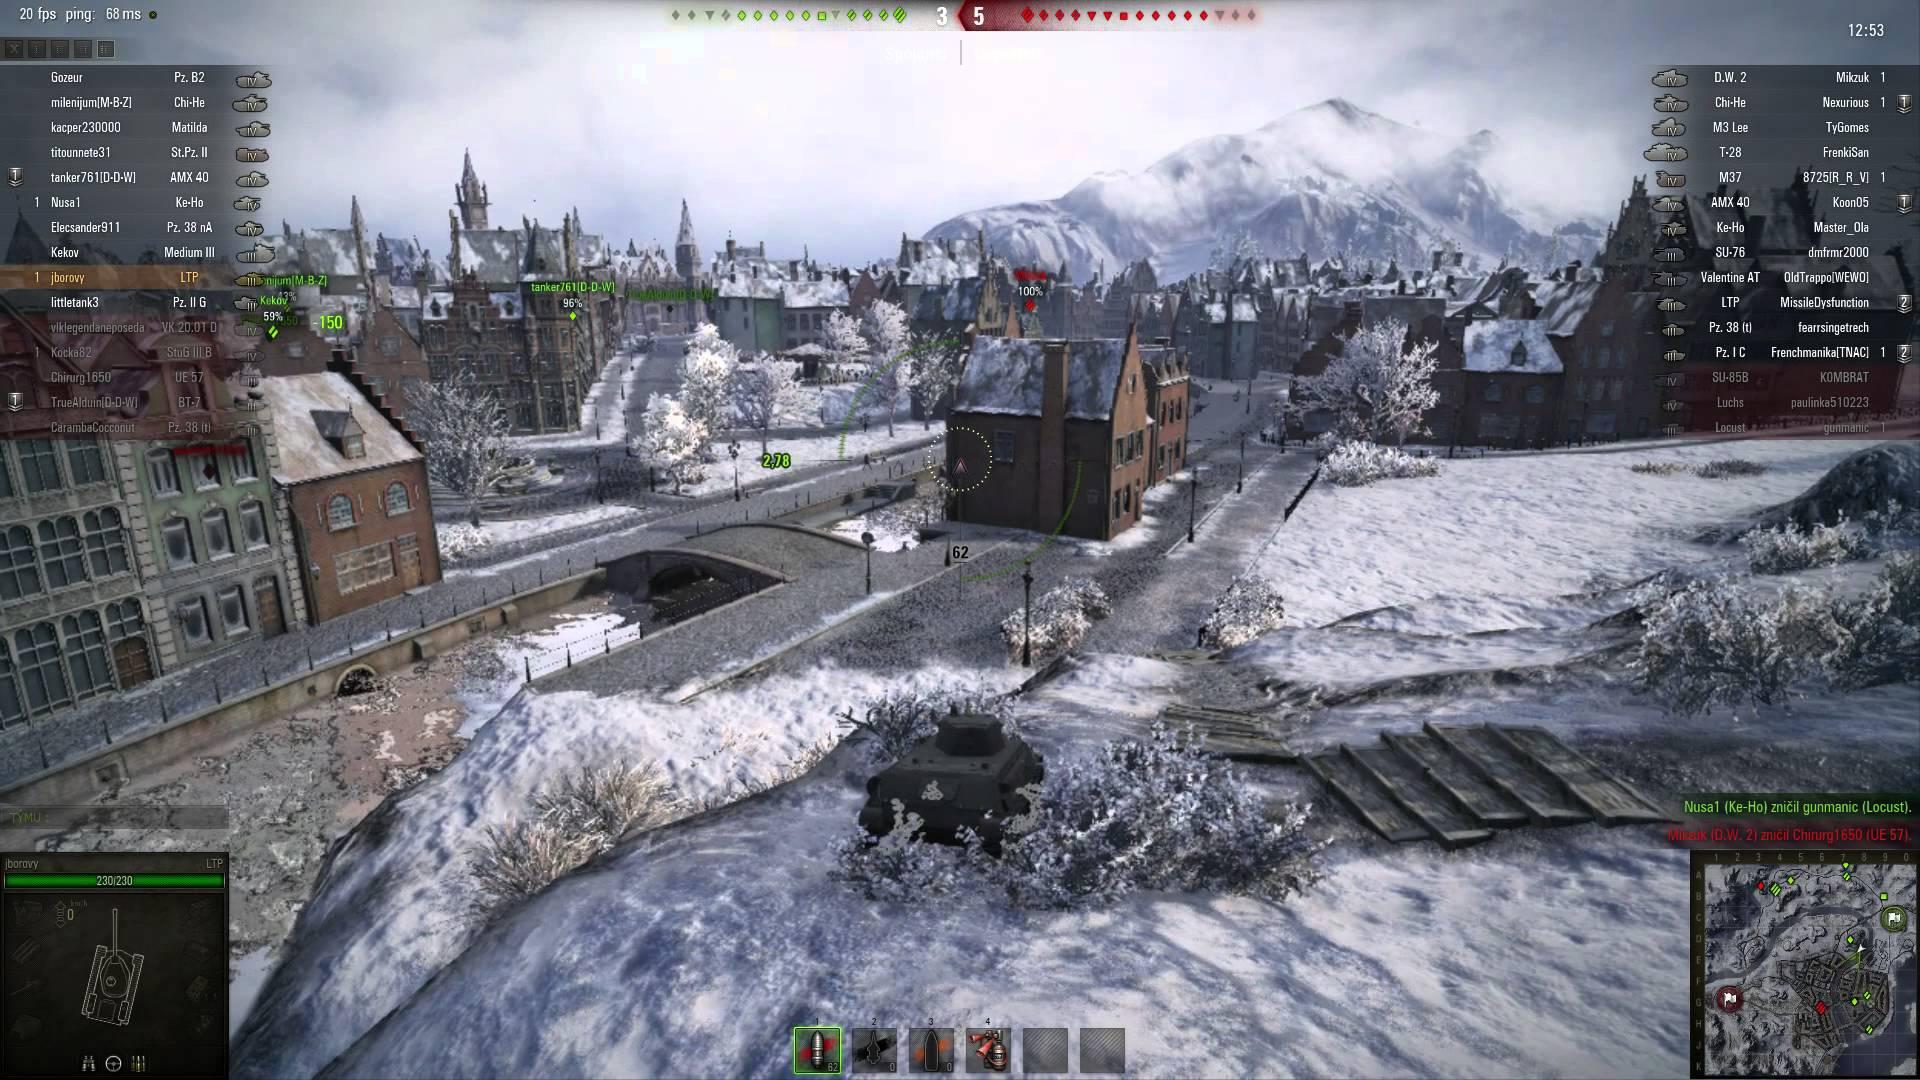 World of Tanks 19